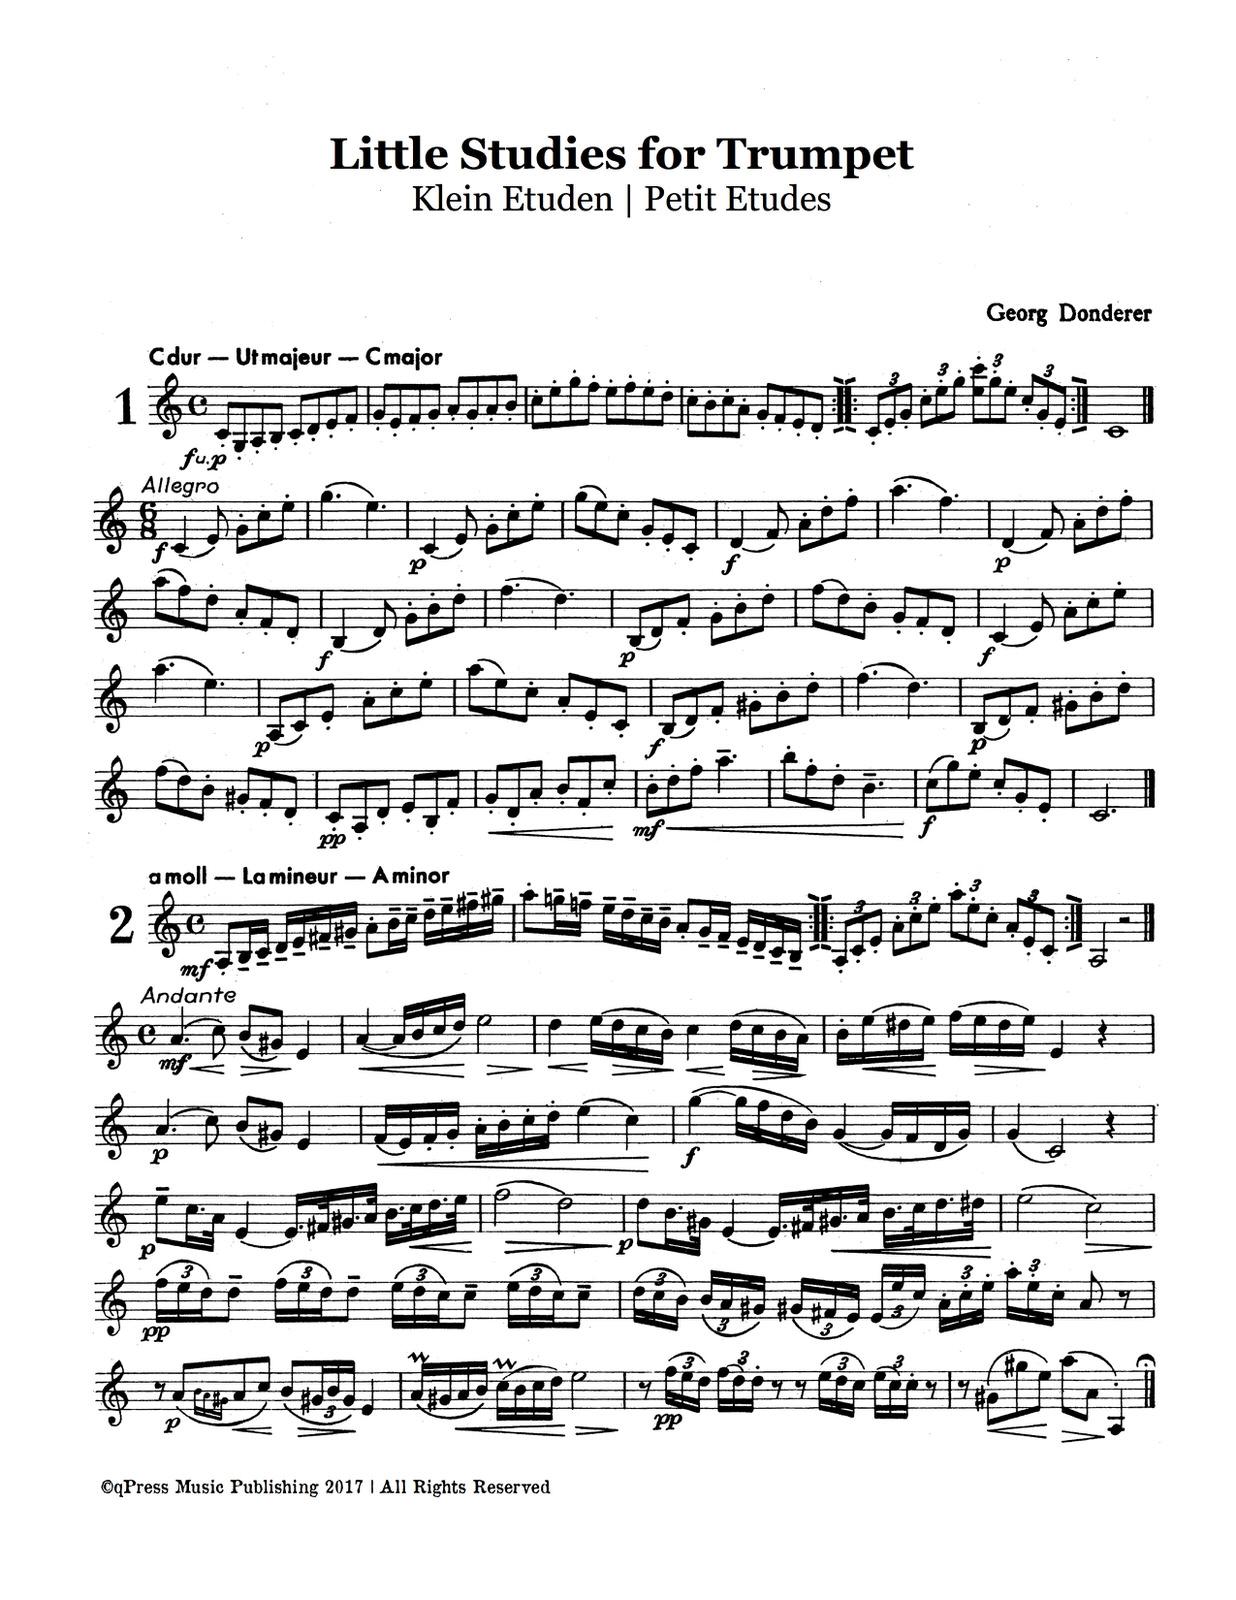 Donderer, Georg, Little Studies for Trumpet-p04